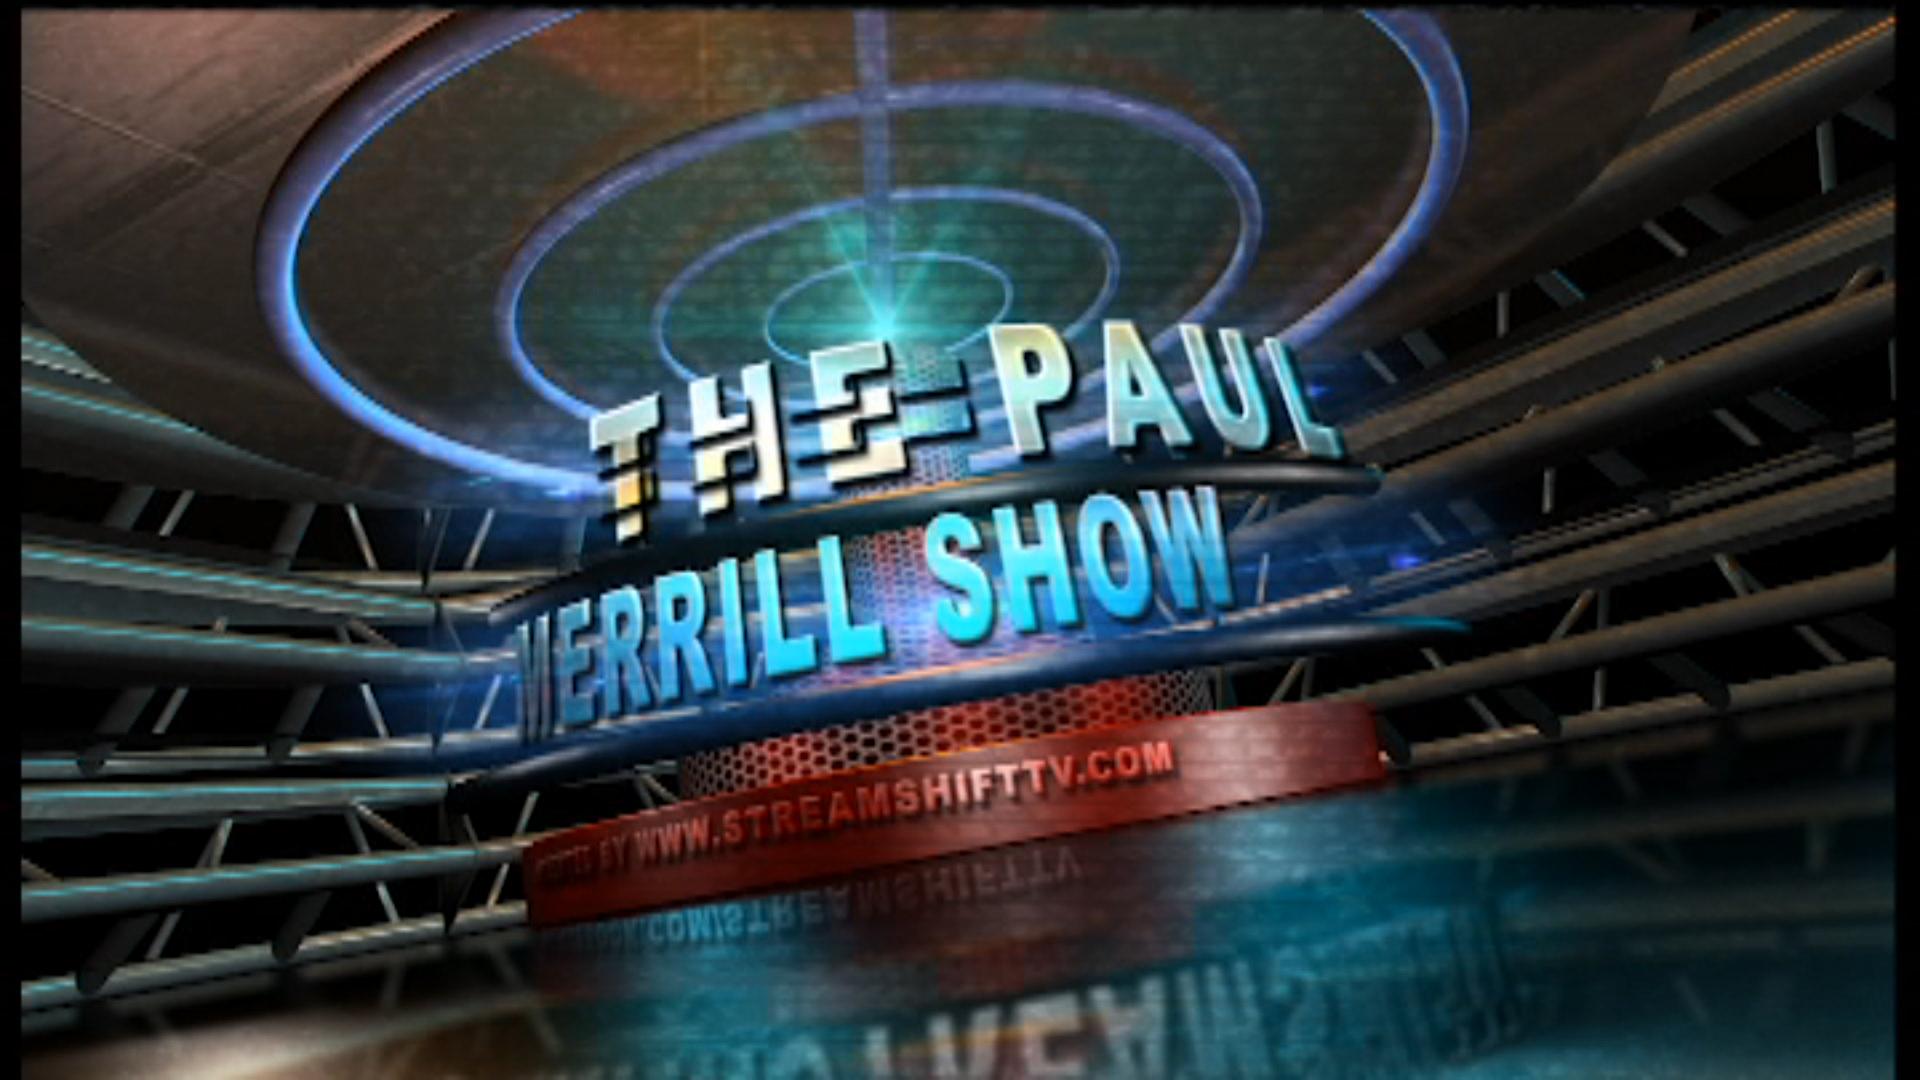 The Paul Merrill Show - July 25th, 2019